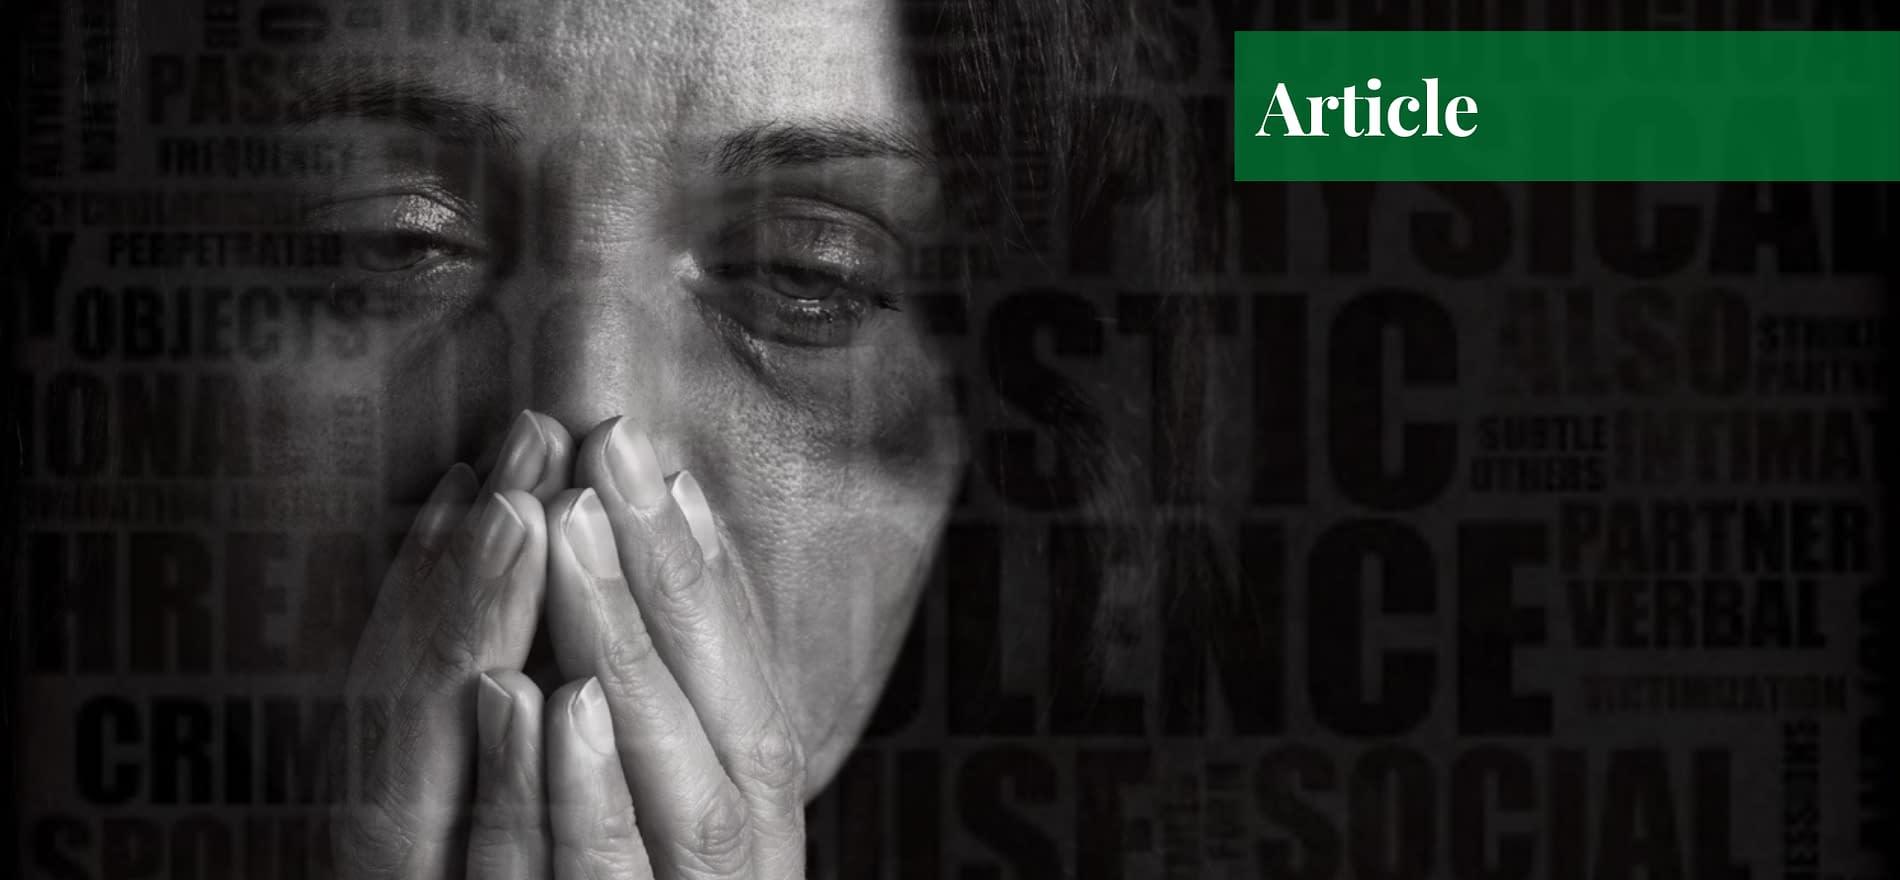 Pakistan domestic abuse